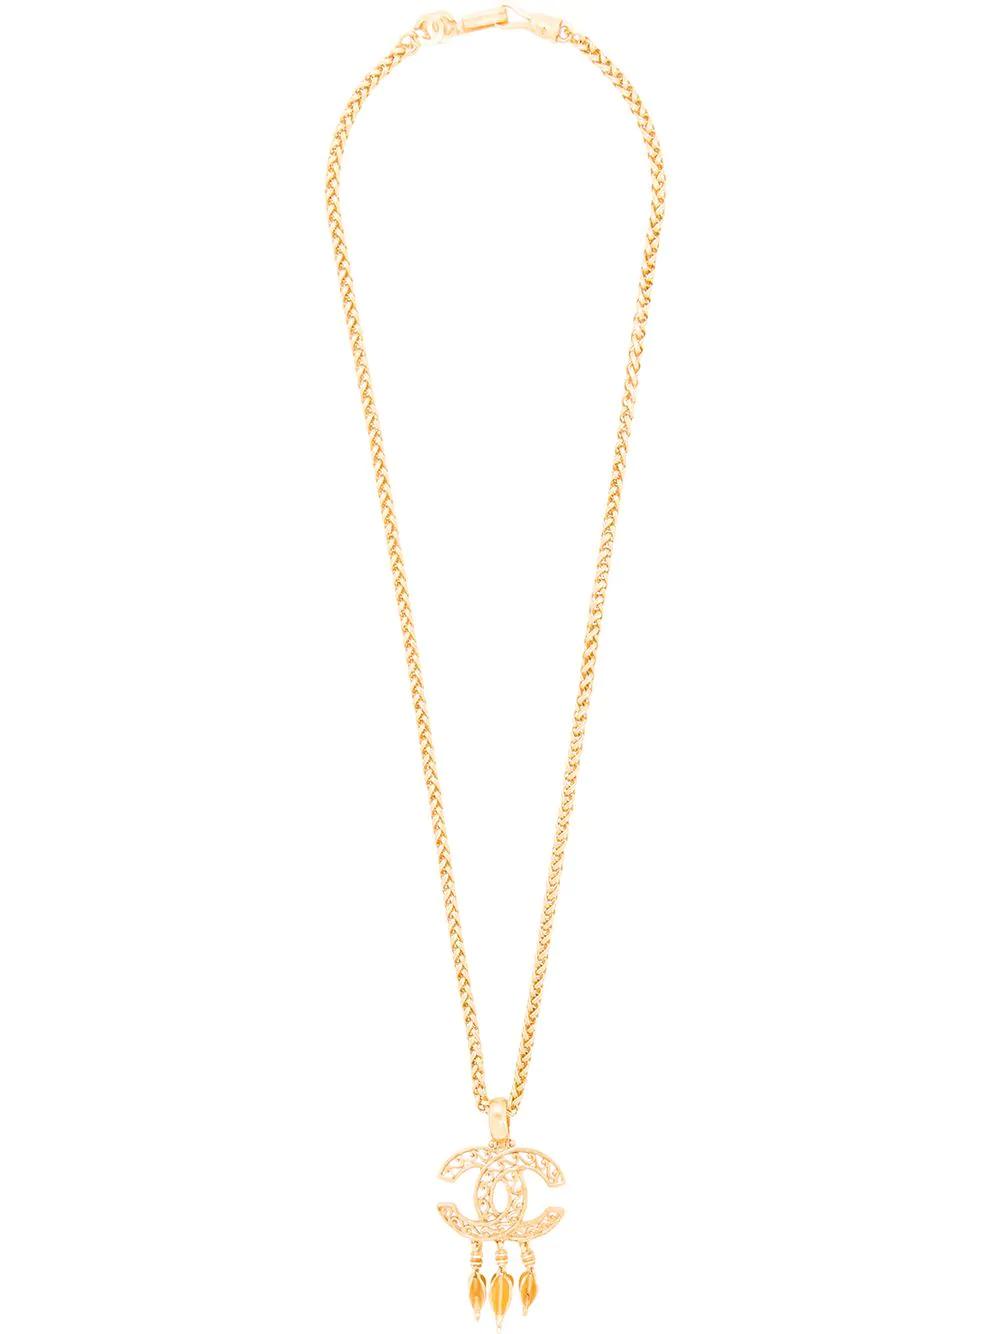 c02c34a09de6 CHANEL. Chanel Vintage Cc Logo Chain Pendant Necklace - Farfetch in Gold